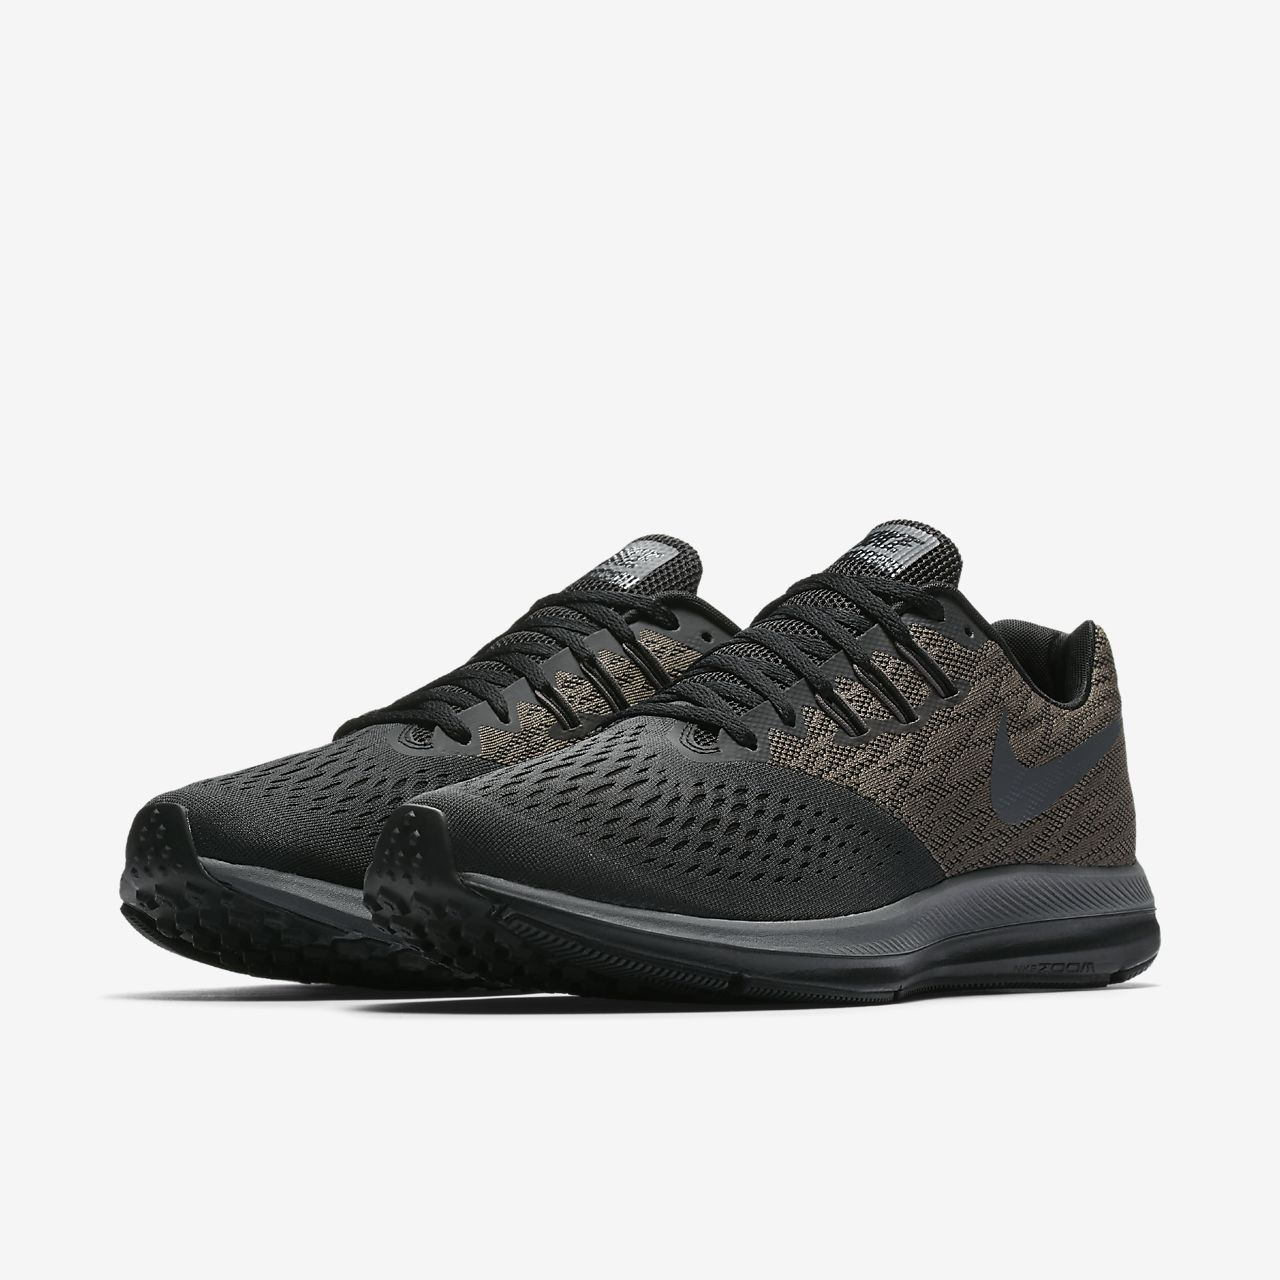 super popular b2791 26f16 ... Nike Zoom Winflo 4 Men s Running Shoe